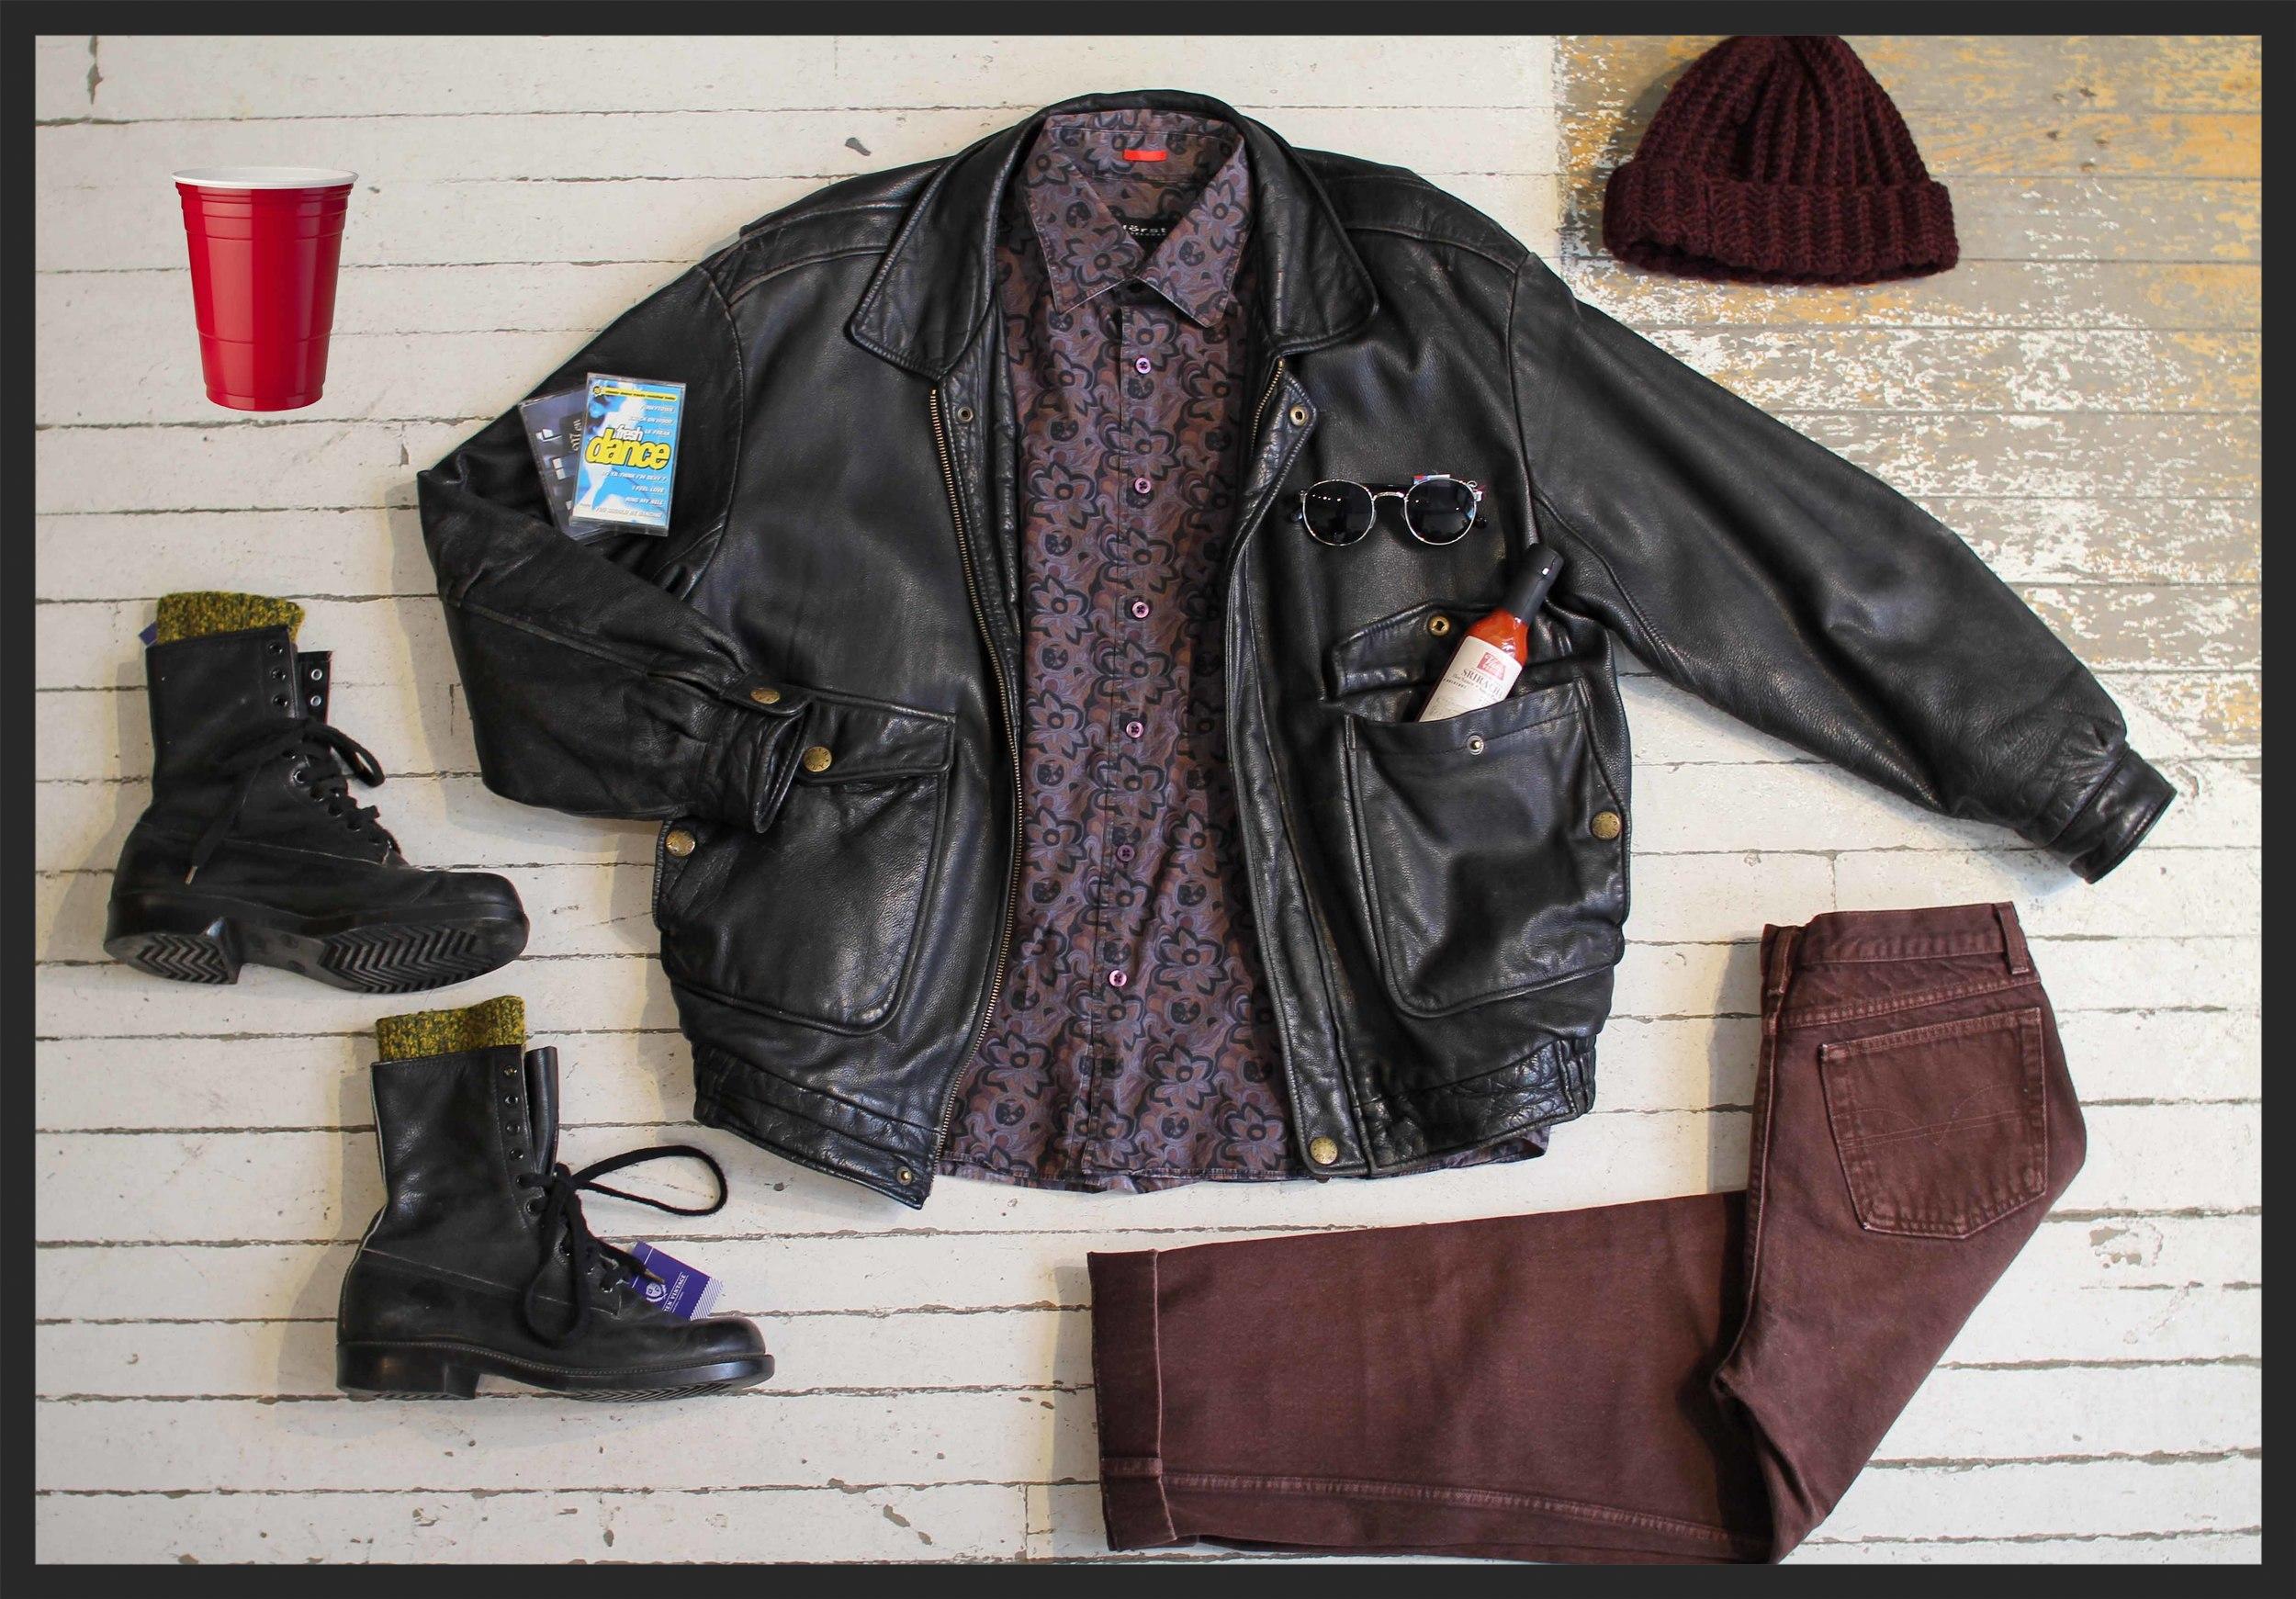 Leather jacket: $89, dress shirt: $29, jeans: $48, Boots:$52, socks: $16, handmade Miyuki Crochet beanie: $48, sunglasses: $34,Vicki's Veggies hot sauce: $8.50